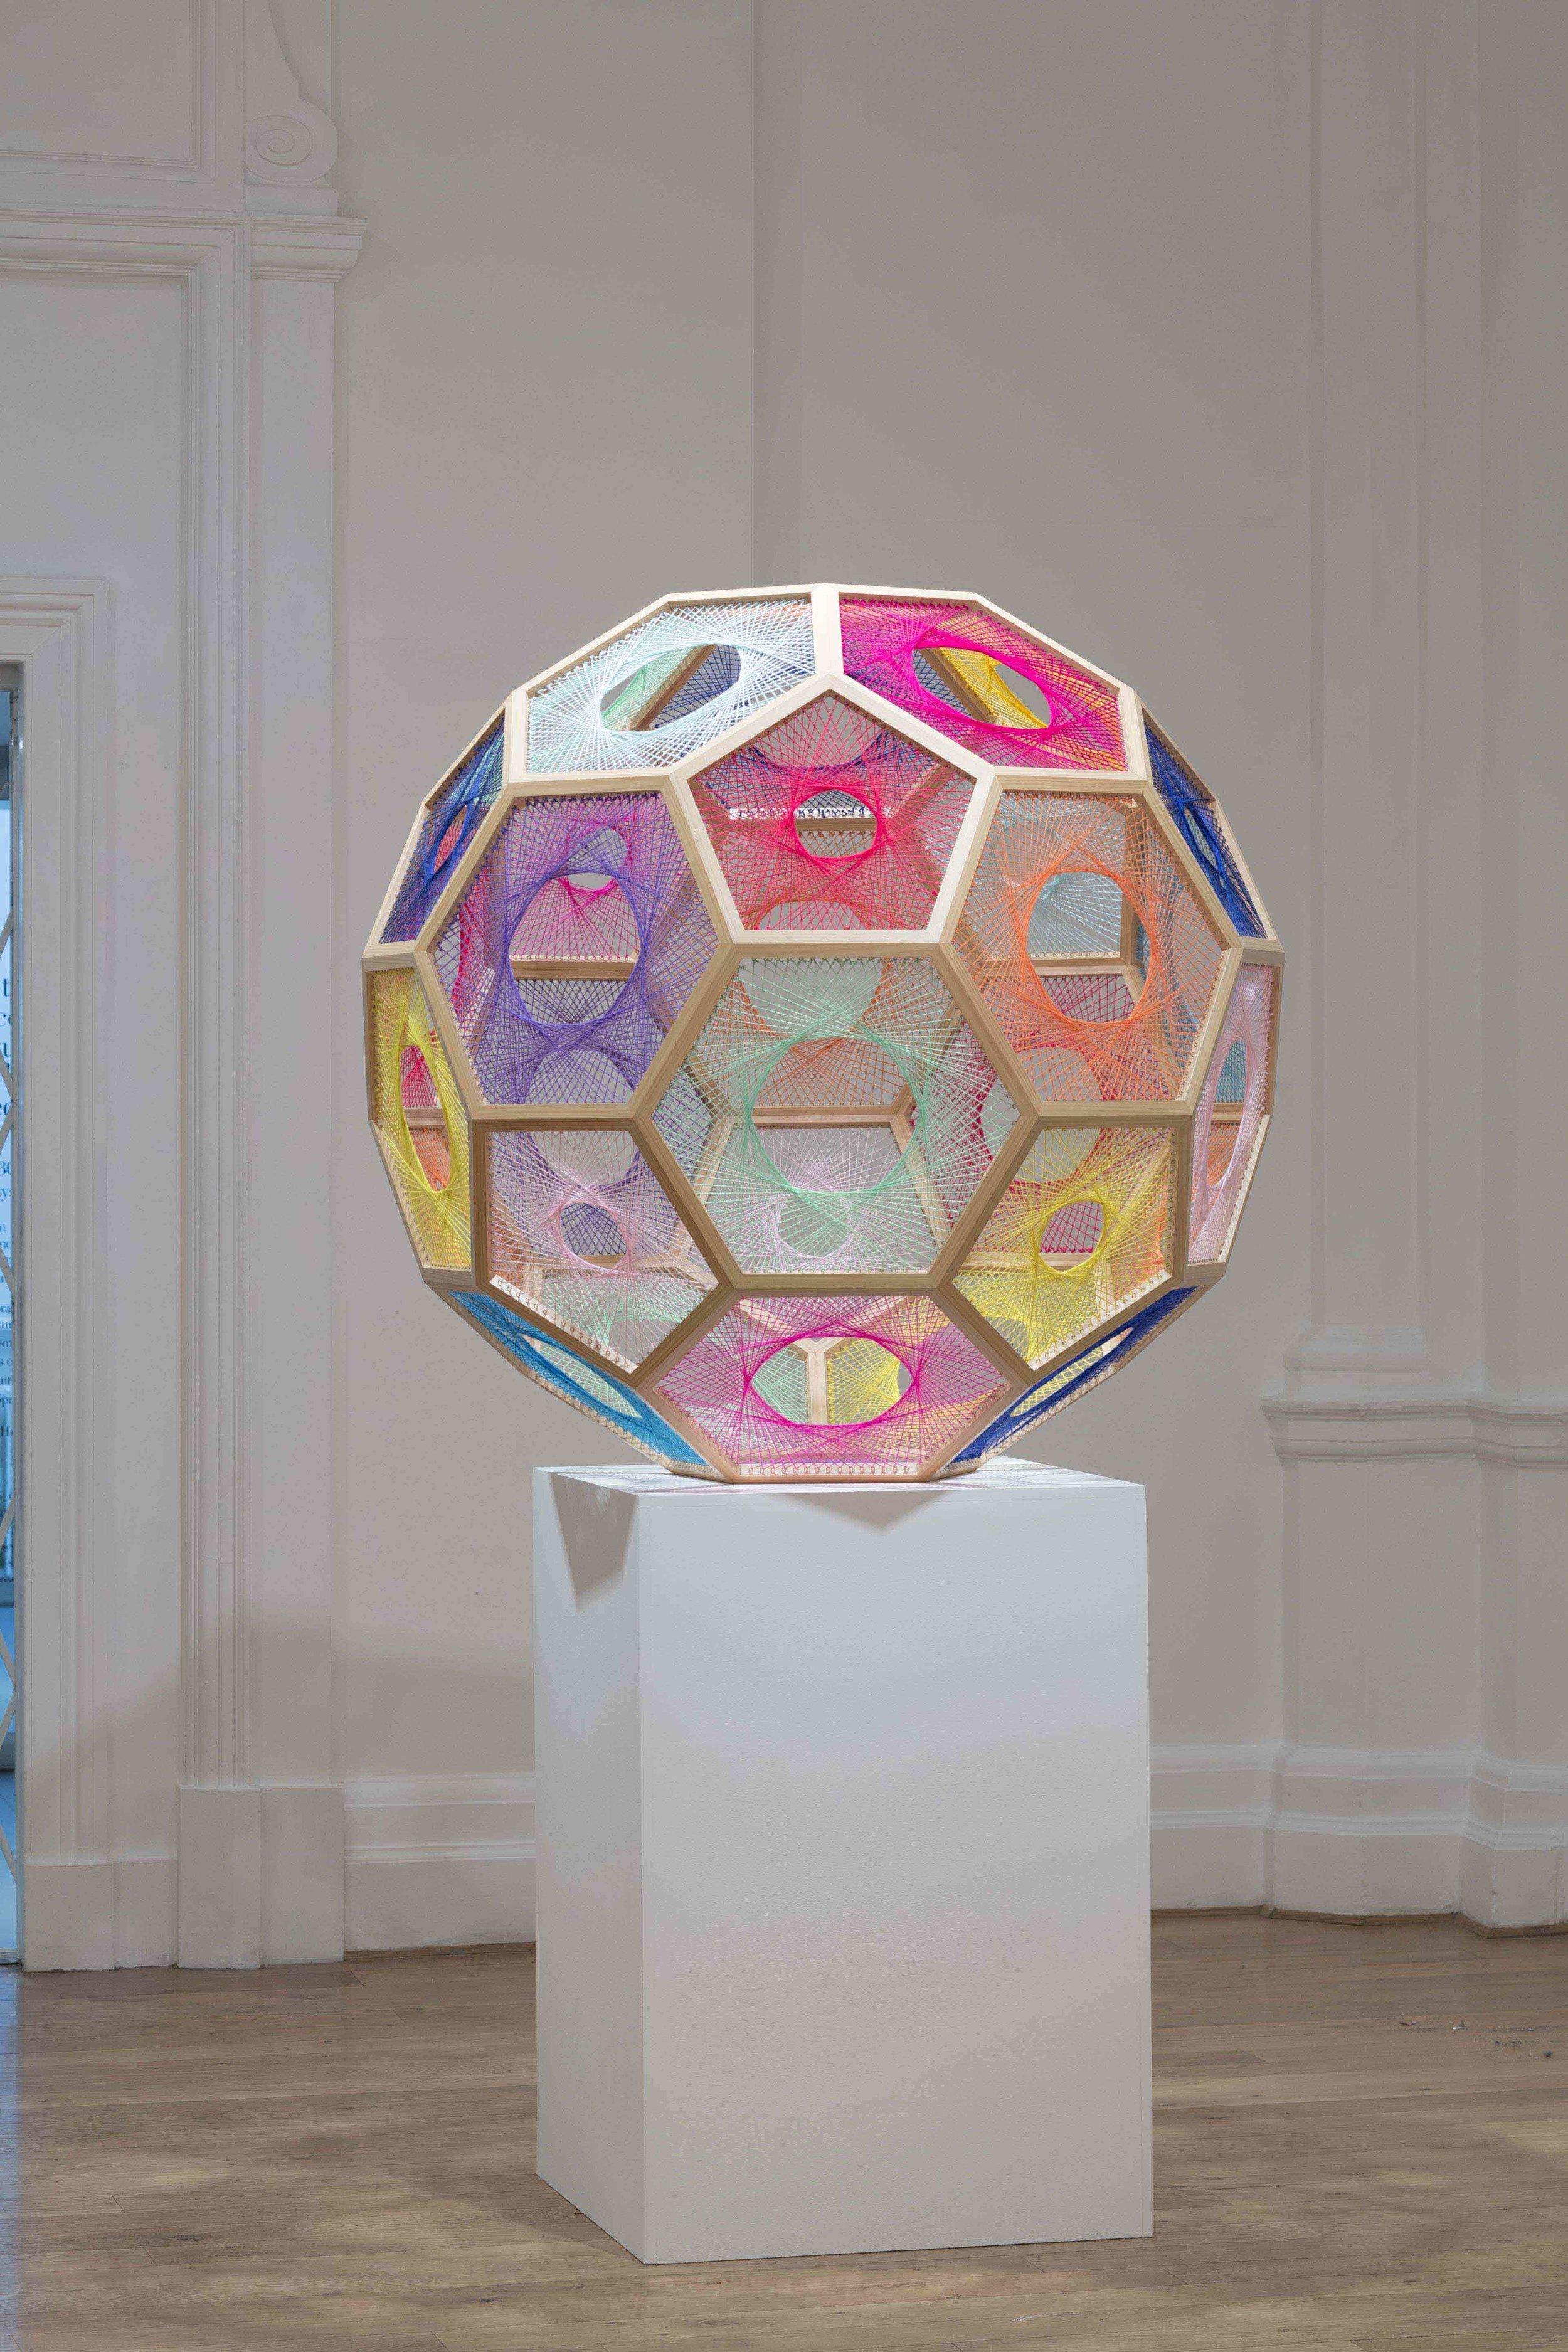 NIKE SAVVAS   Sliding Ladder: Truncated Icosahedron  2010 Wood, wool and steel 130 x 130 cm